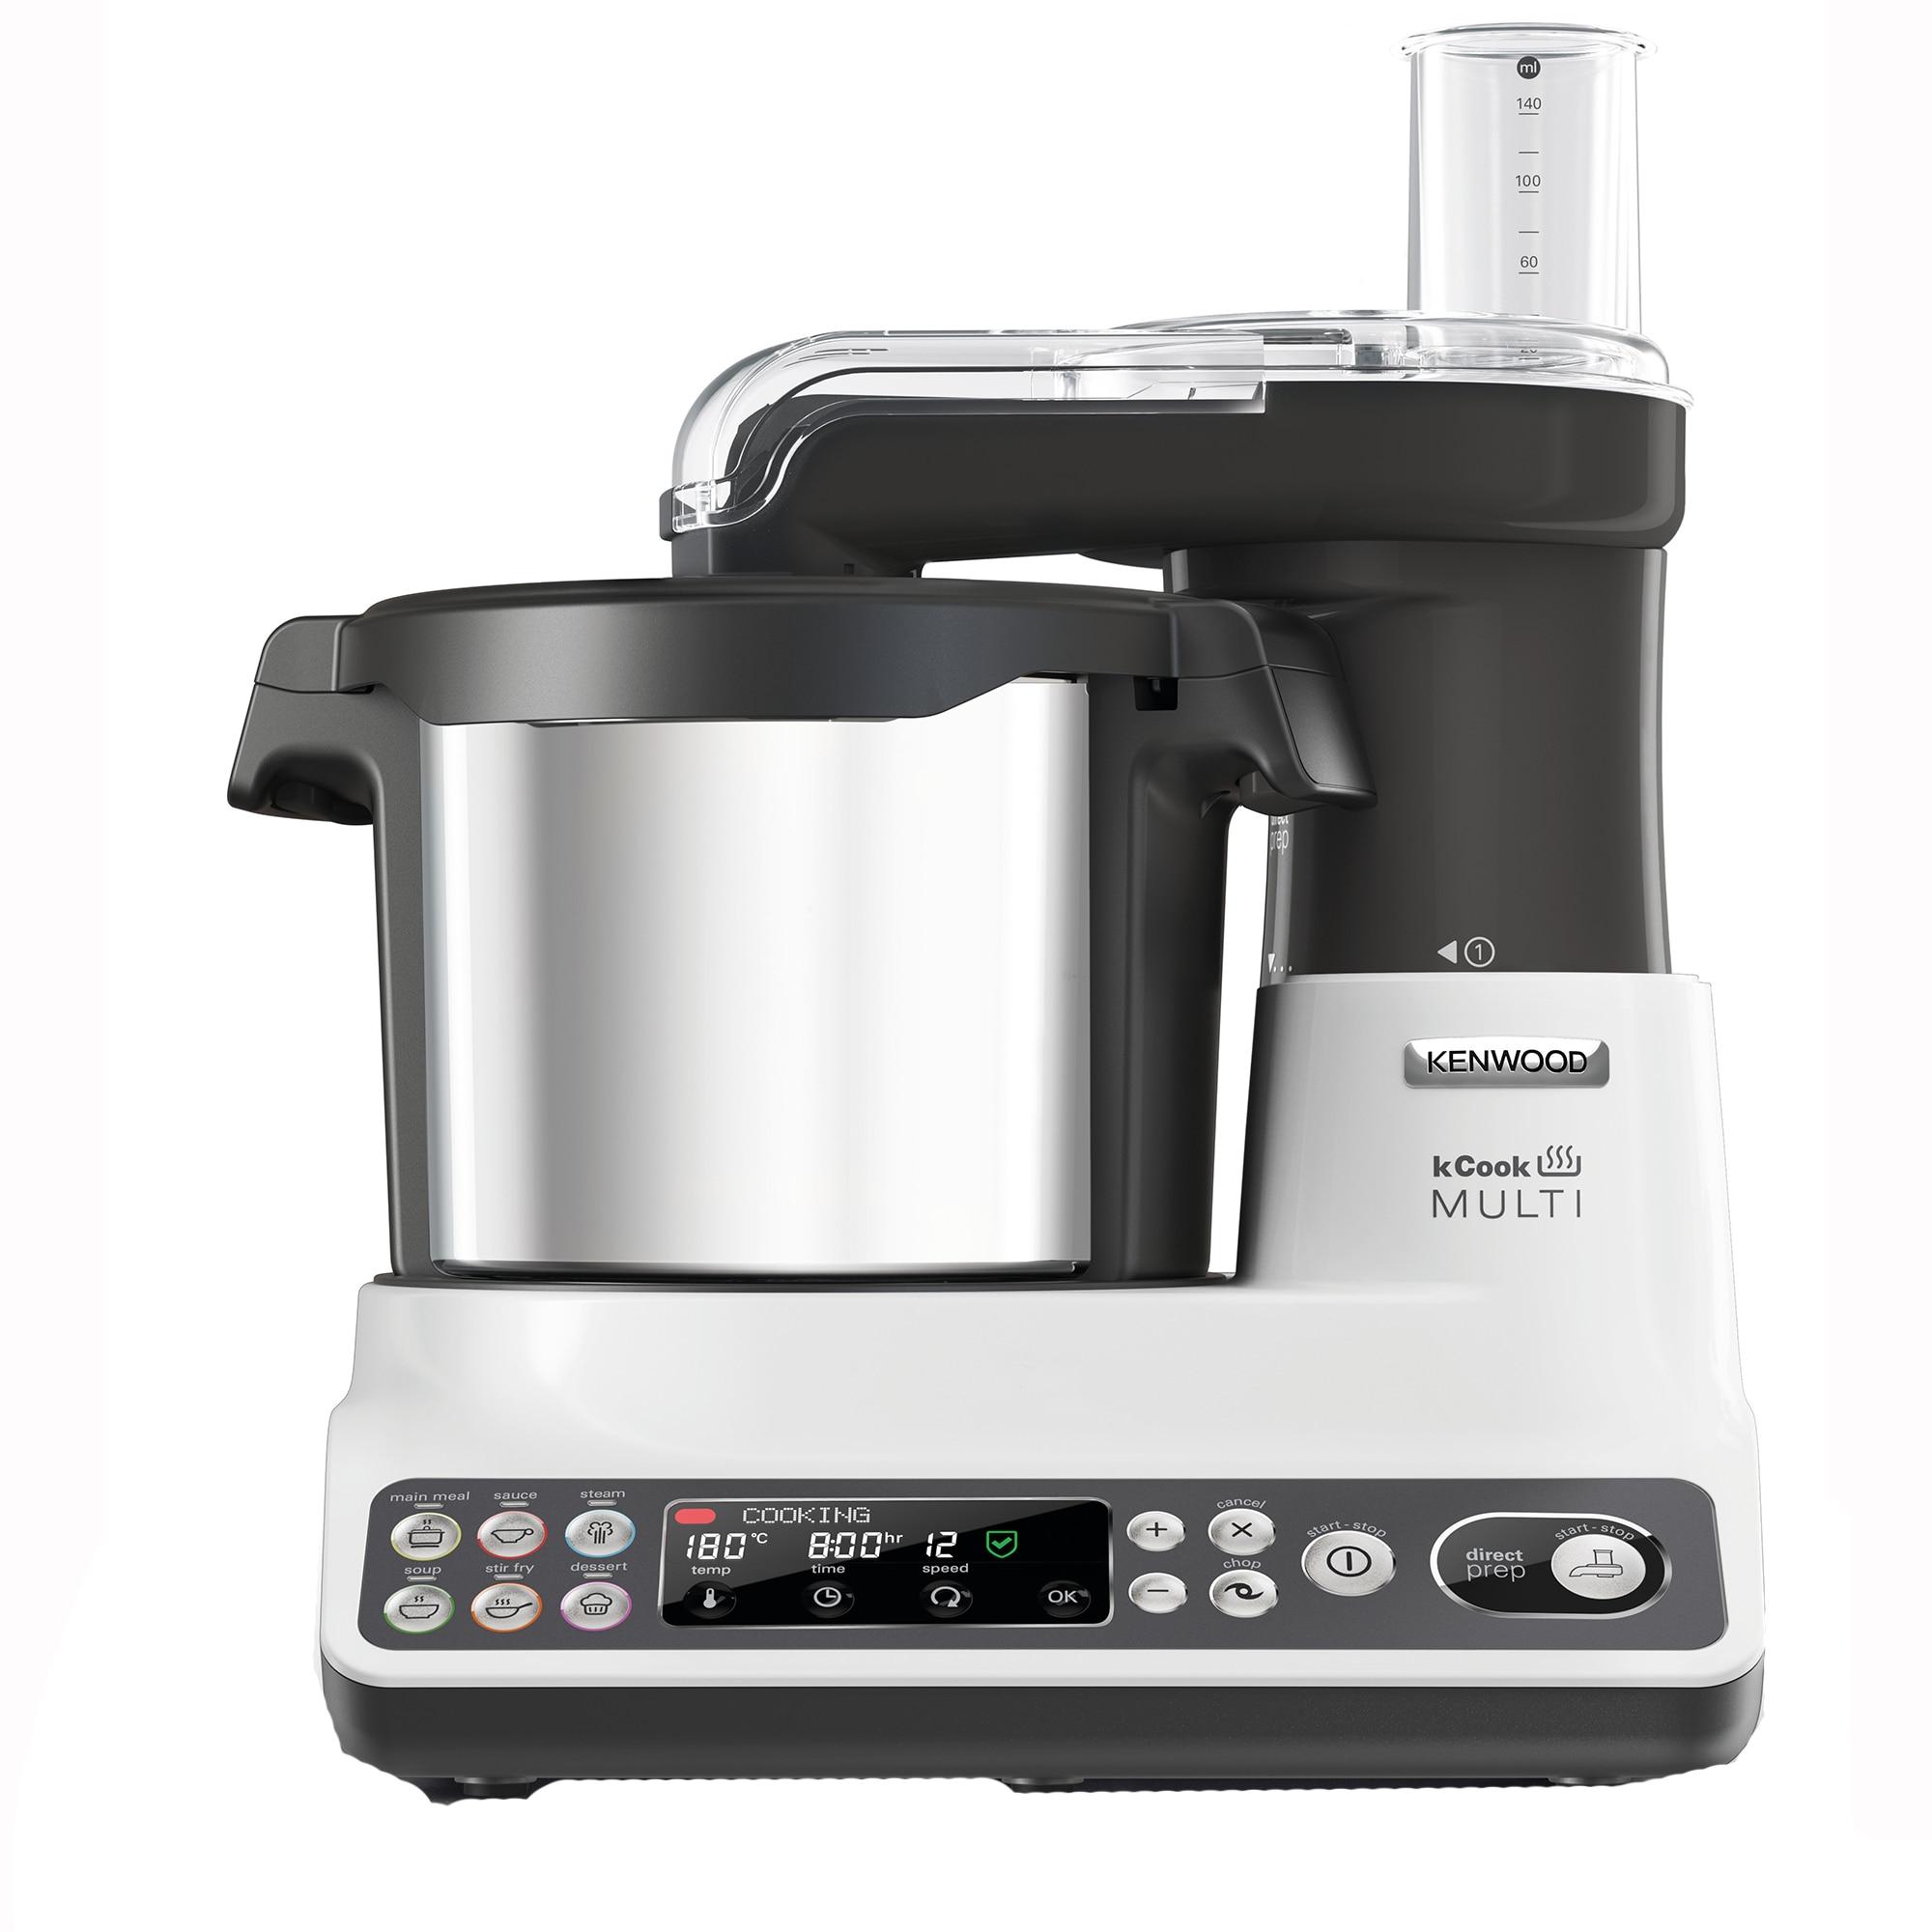 Fotografie Robot de bucatarie Kenwood kCook Multi Cooking CCL401WH, 1500W, 4.5L bol, 6 Functii, Aplicatie mobila, Alb-Gri